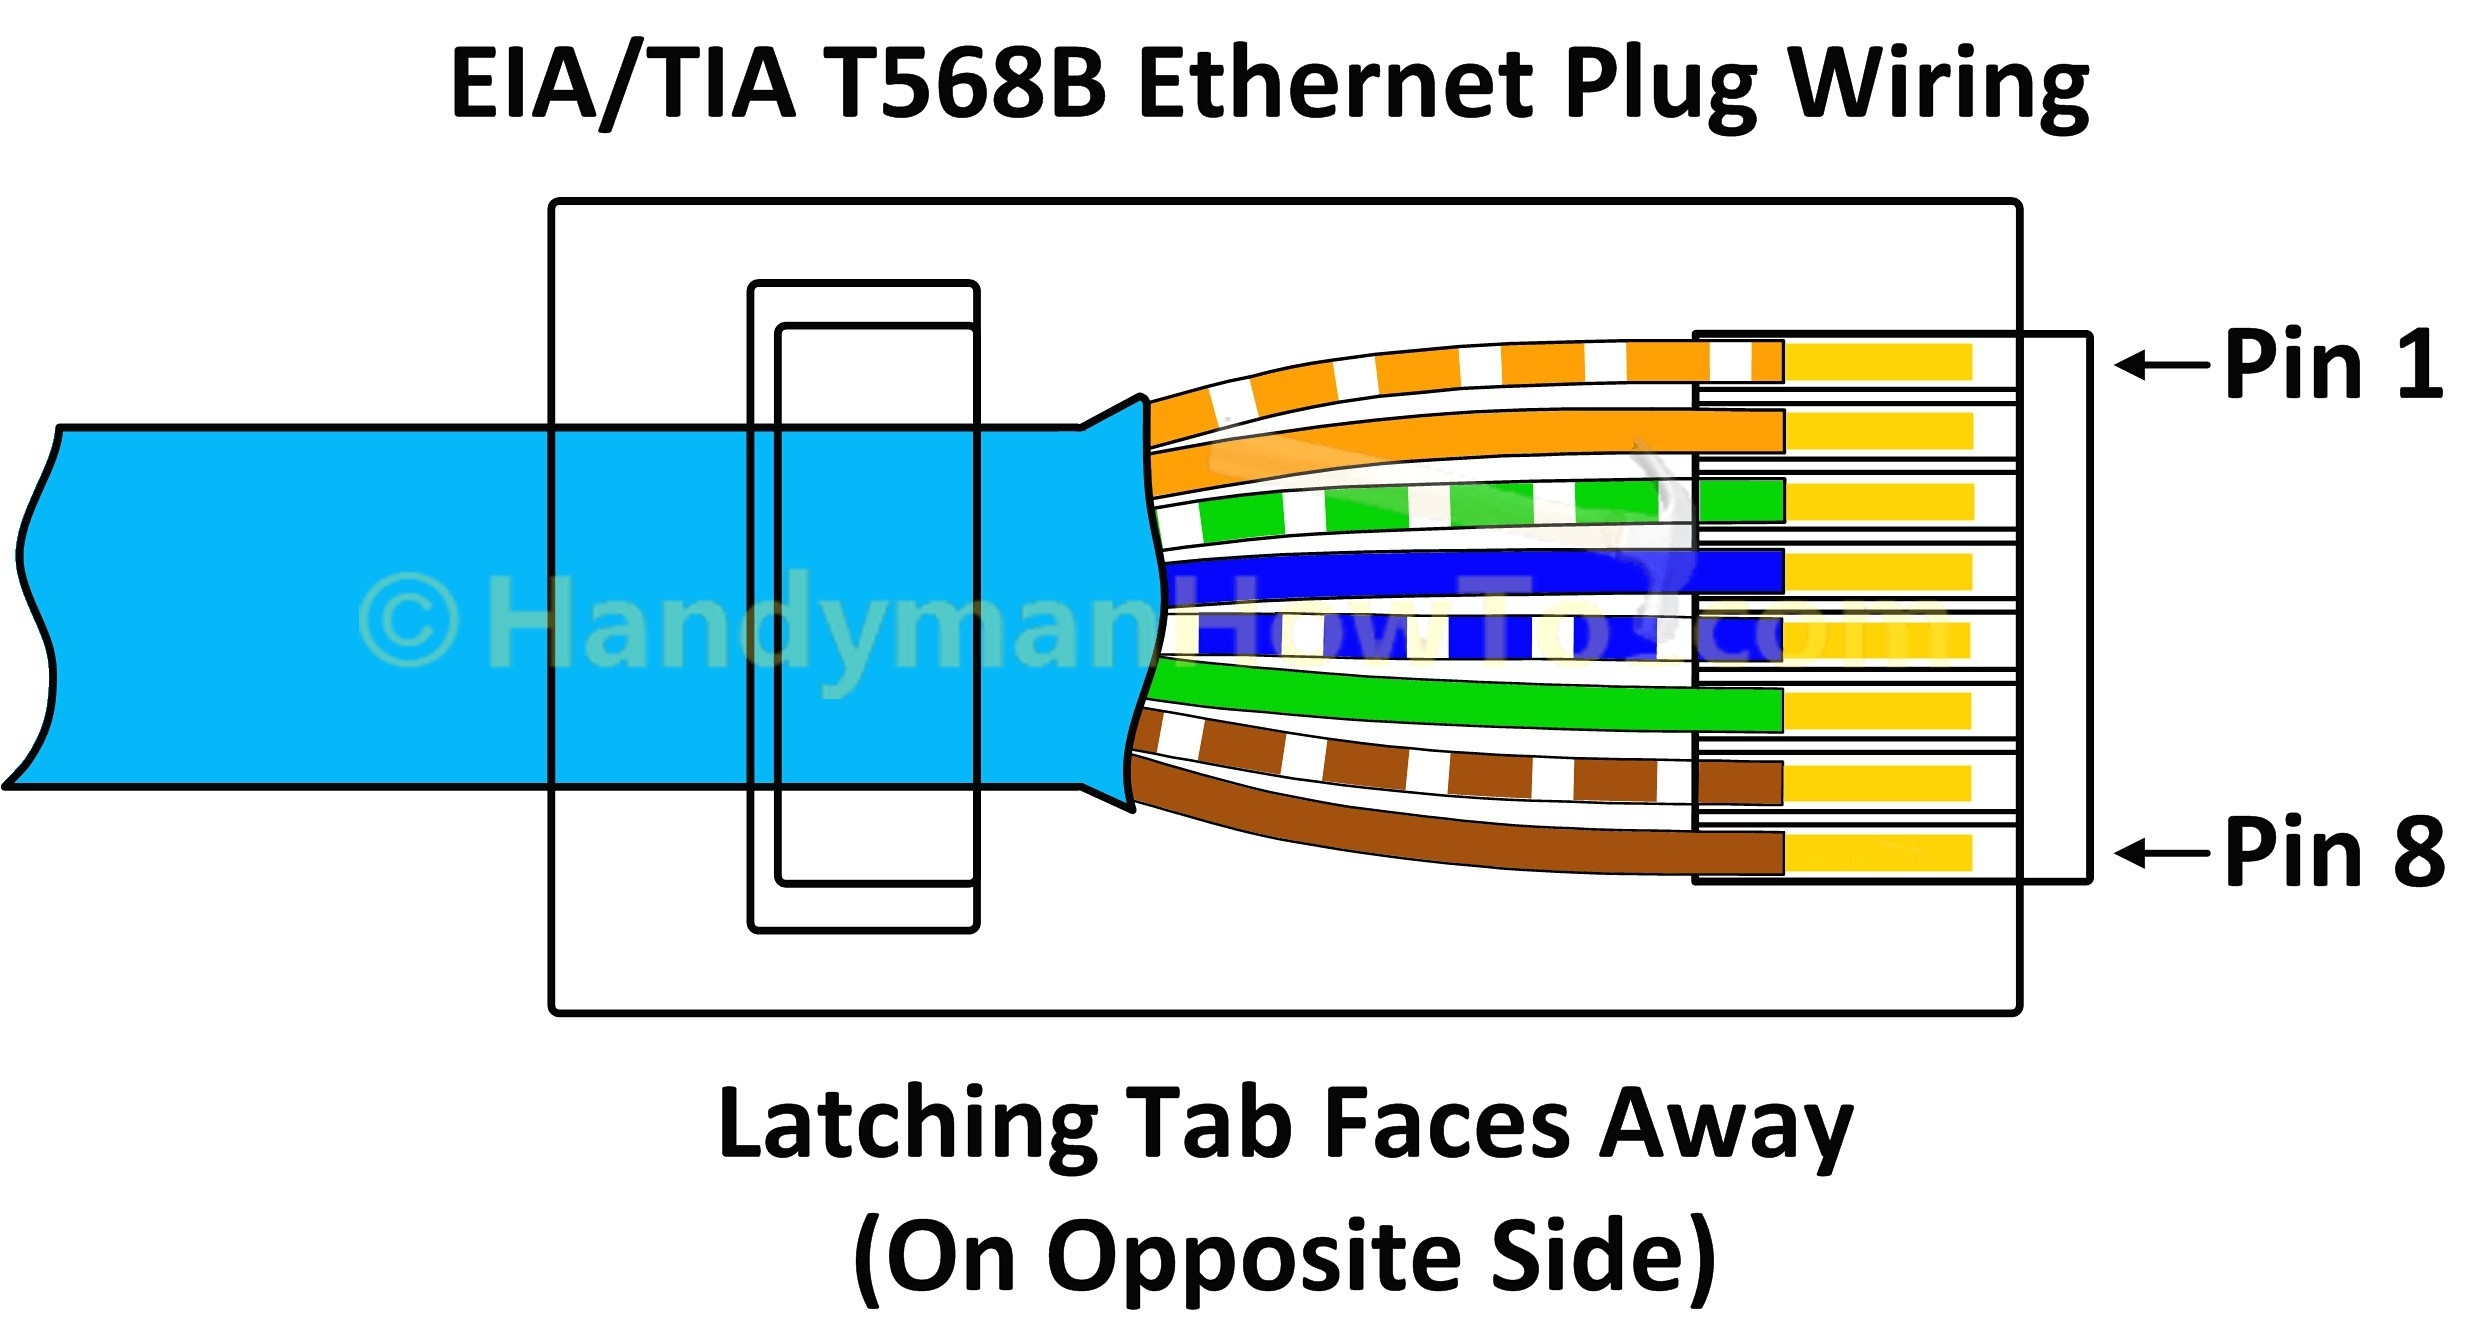 ideal cat 5 wiring diagram wiring diagram Switchgear Wiring Diagrams straight cat5 wiring diagram wiring diagram updatecat5 wiring diagram ideal 20 9 gesundheitspraxis muelhoff de \\